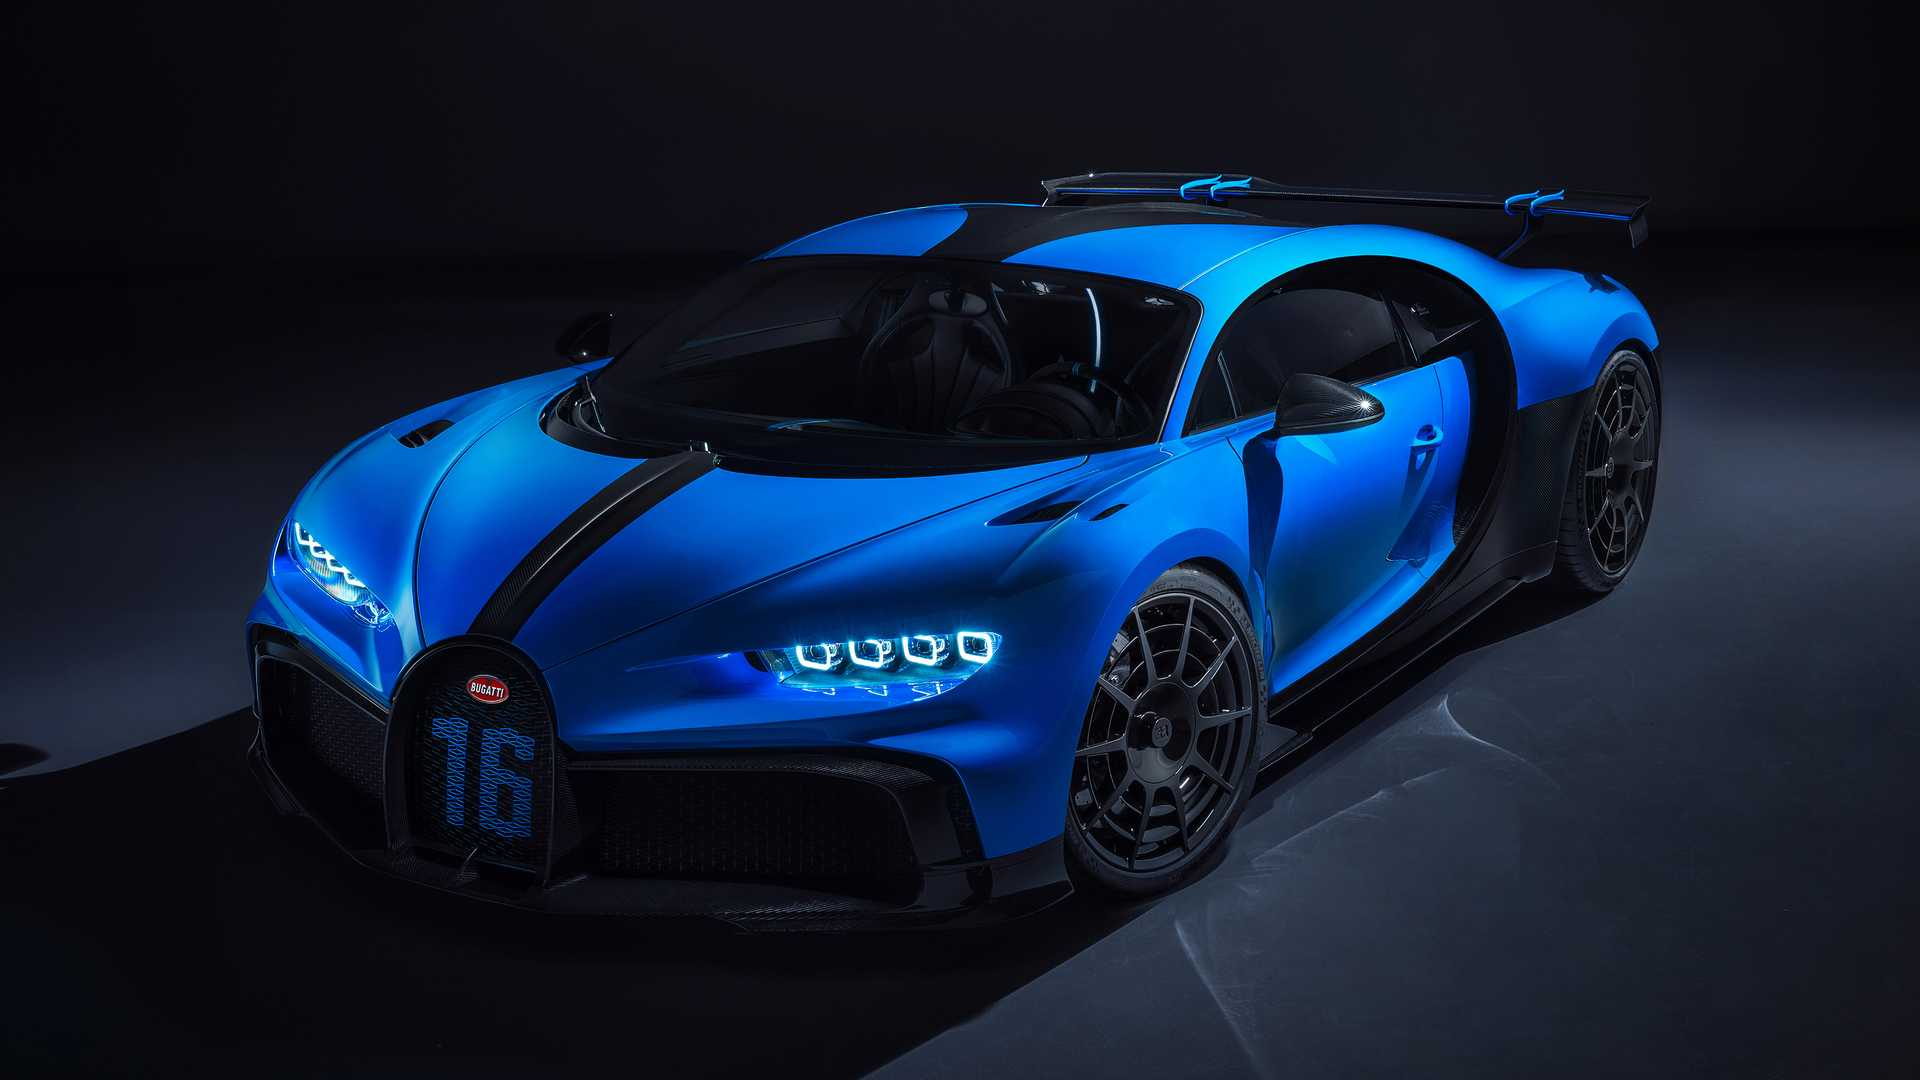 2020 Bugatti Veyron Spesification